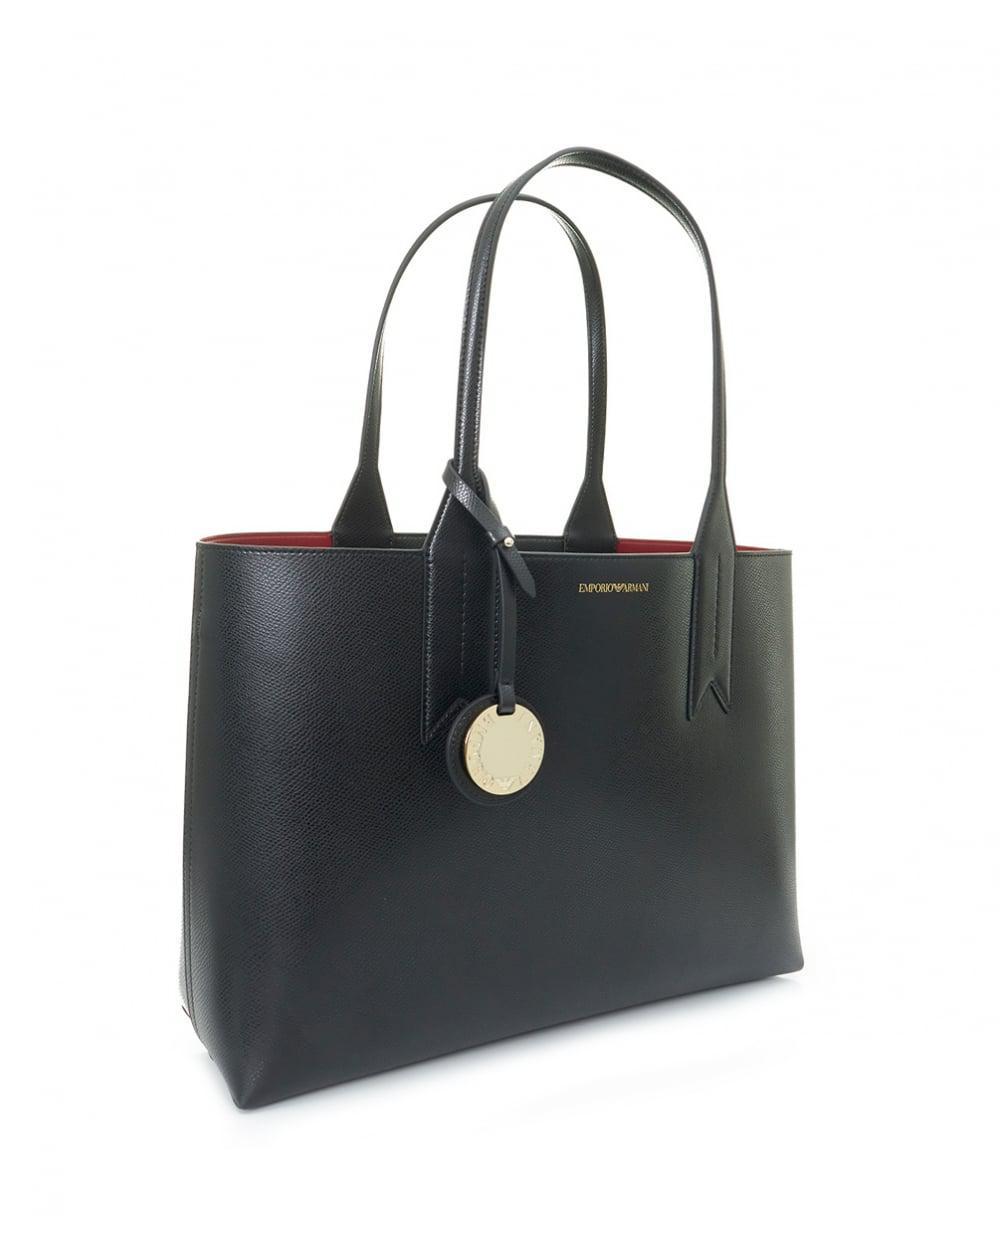 425ed631696c Lyst - Emporio Armani Frida Large Eco Leather Shopper in Black